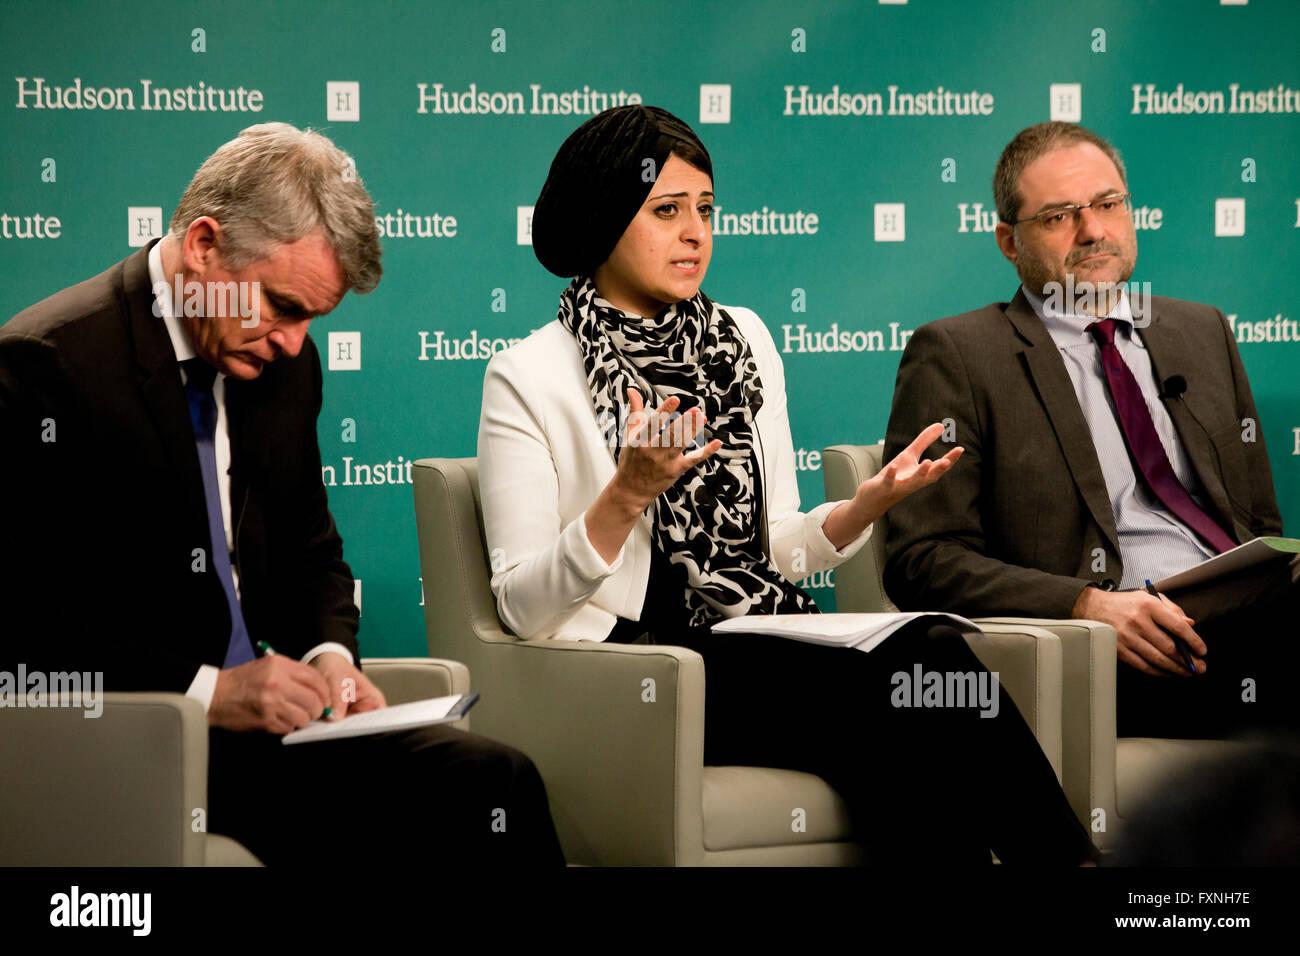 Jomana Qaddour, Policy Analyst bei uns the Commission on International Religious Freedom - 29. März 2016, Washington, Stockbild